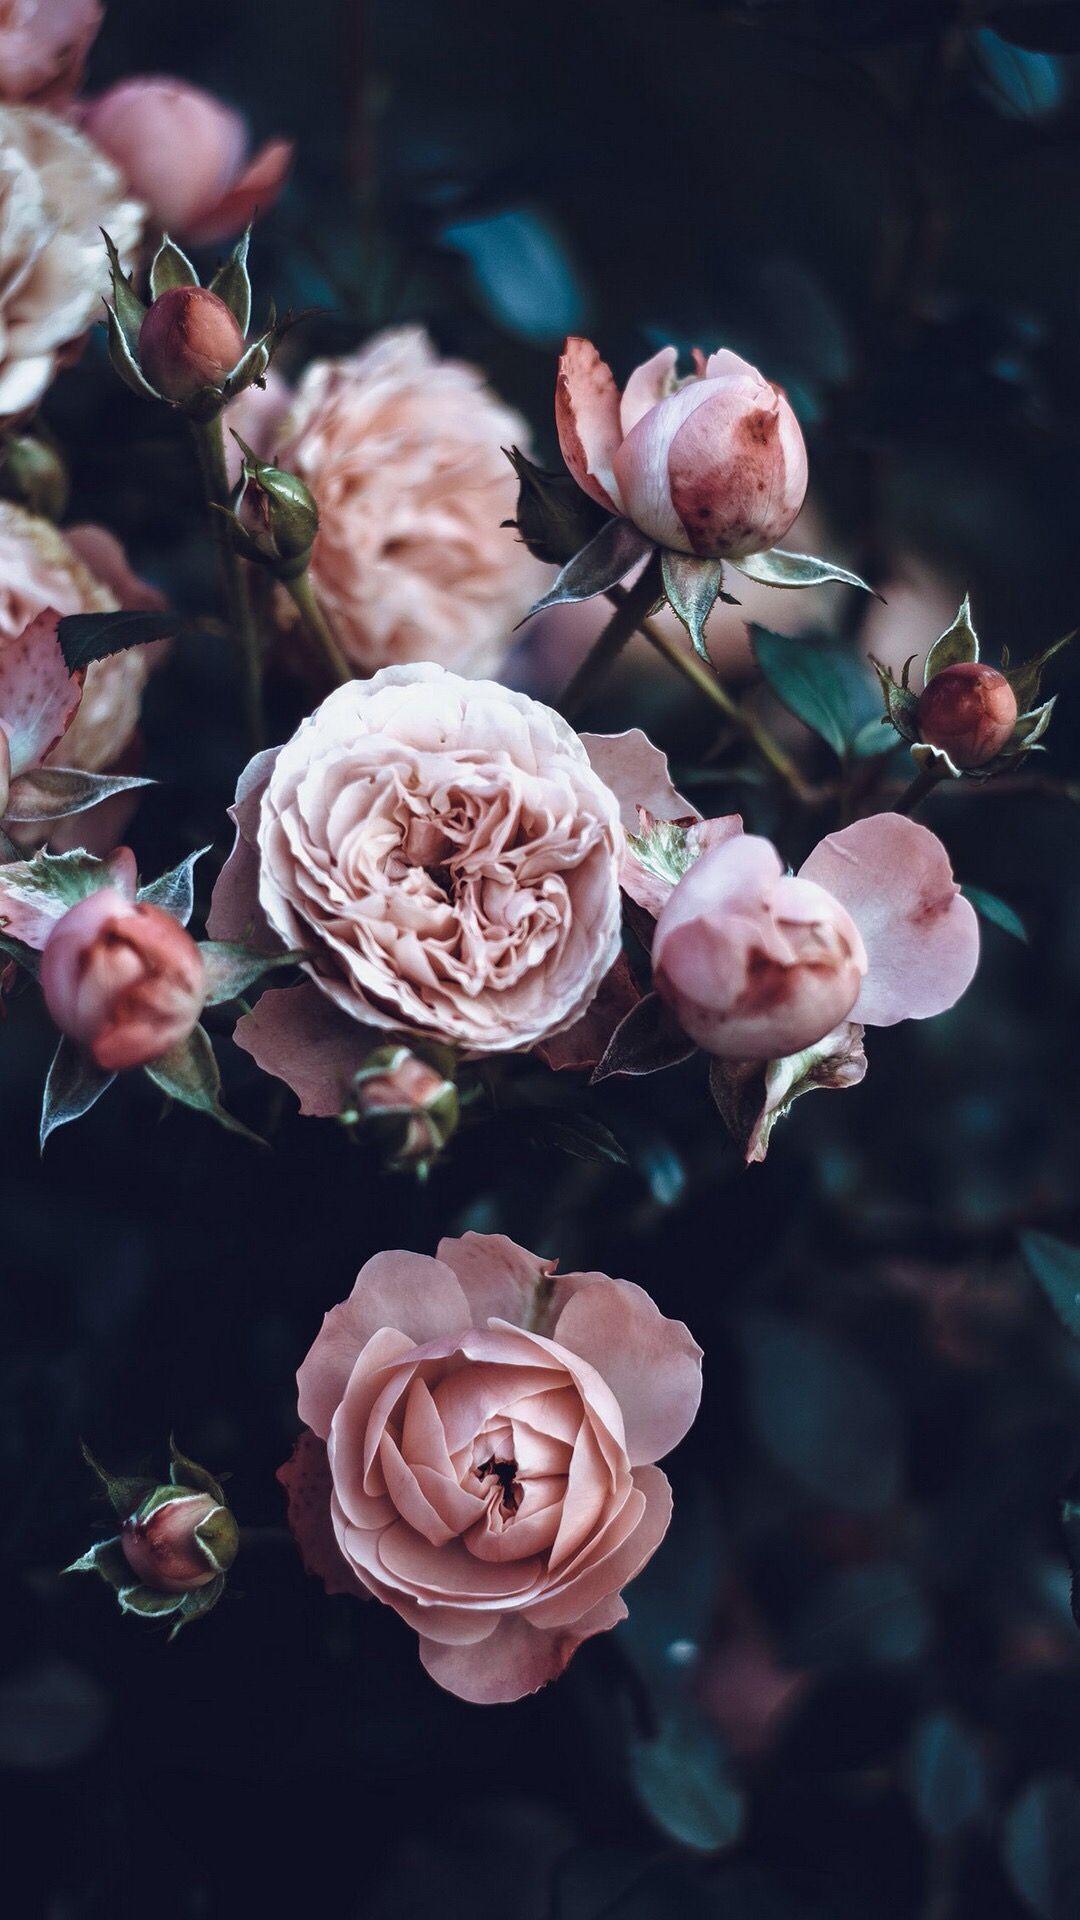 Wallpaper Background Lockscreen Iphone Pink Rose Roses